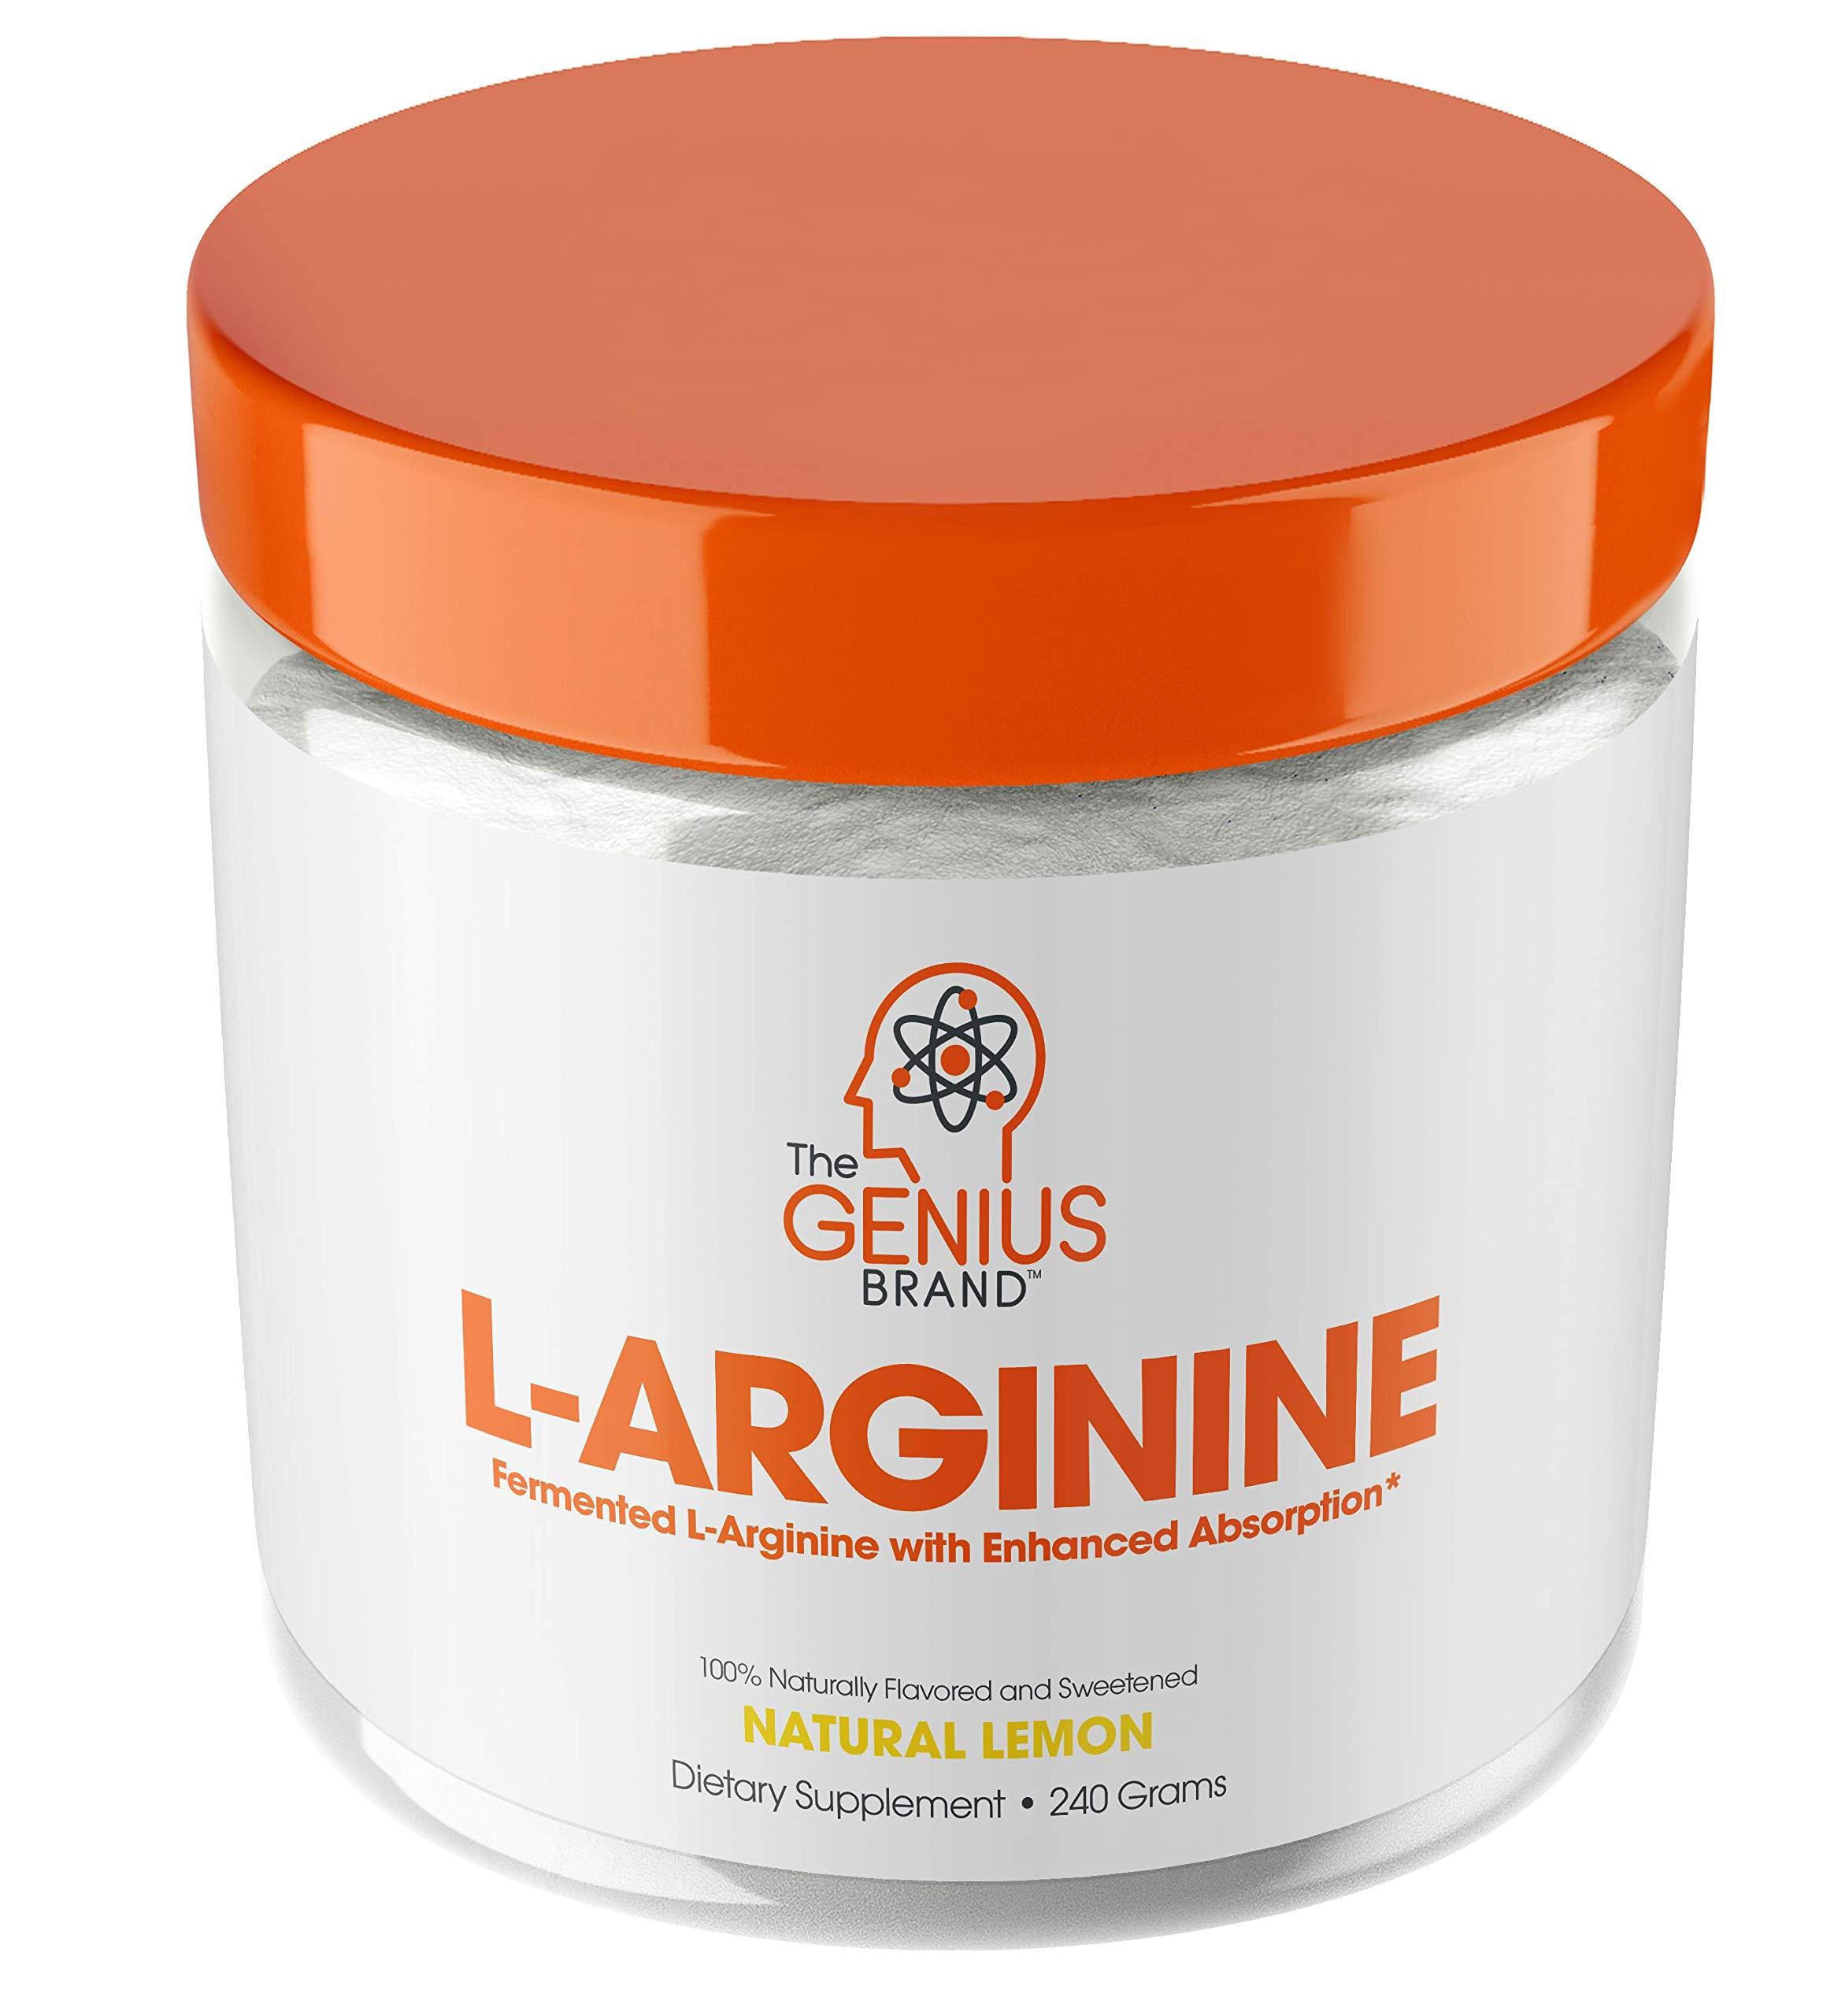 Genius L Arginine Powder - Fermented L-Arginine Nitric Oxide Supplement, Natural Muscle Builder & NO Booster for Healthy Blood Pressure, Protein Synthesis and Strength Building, Lemon, 30 Sv